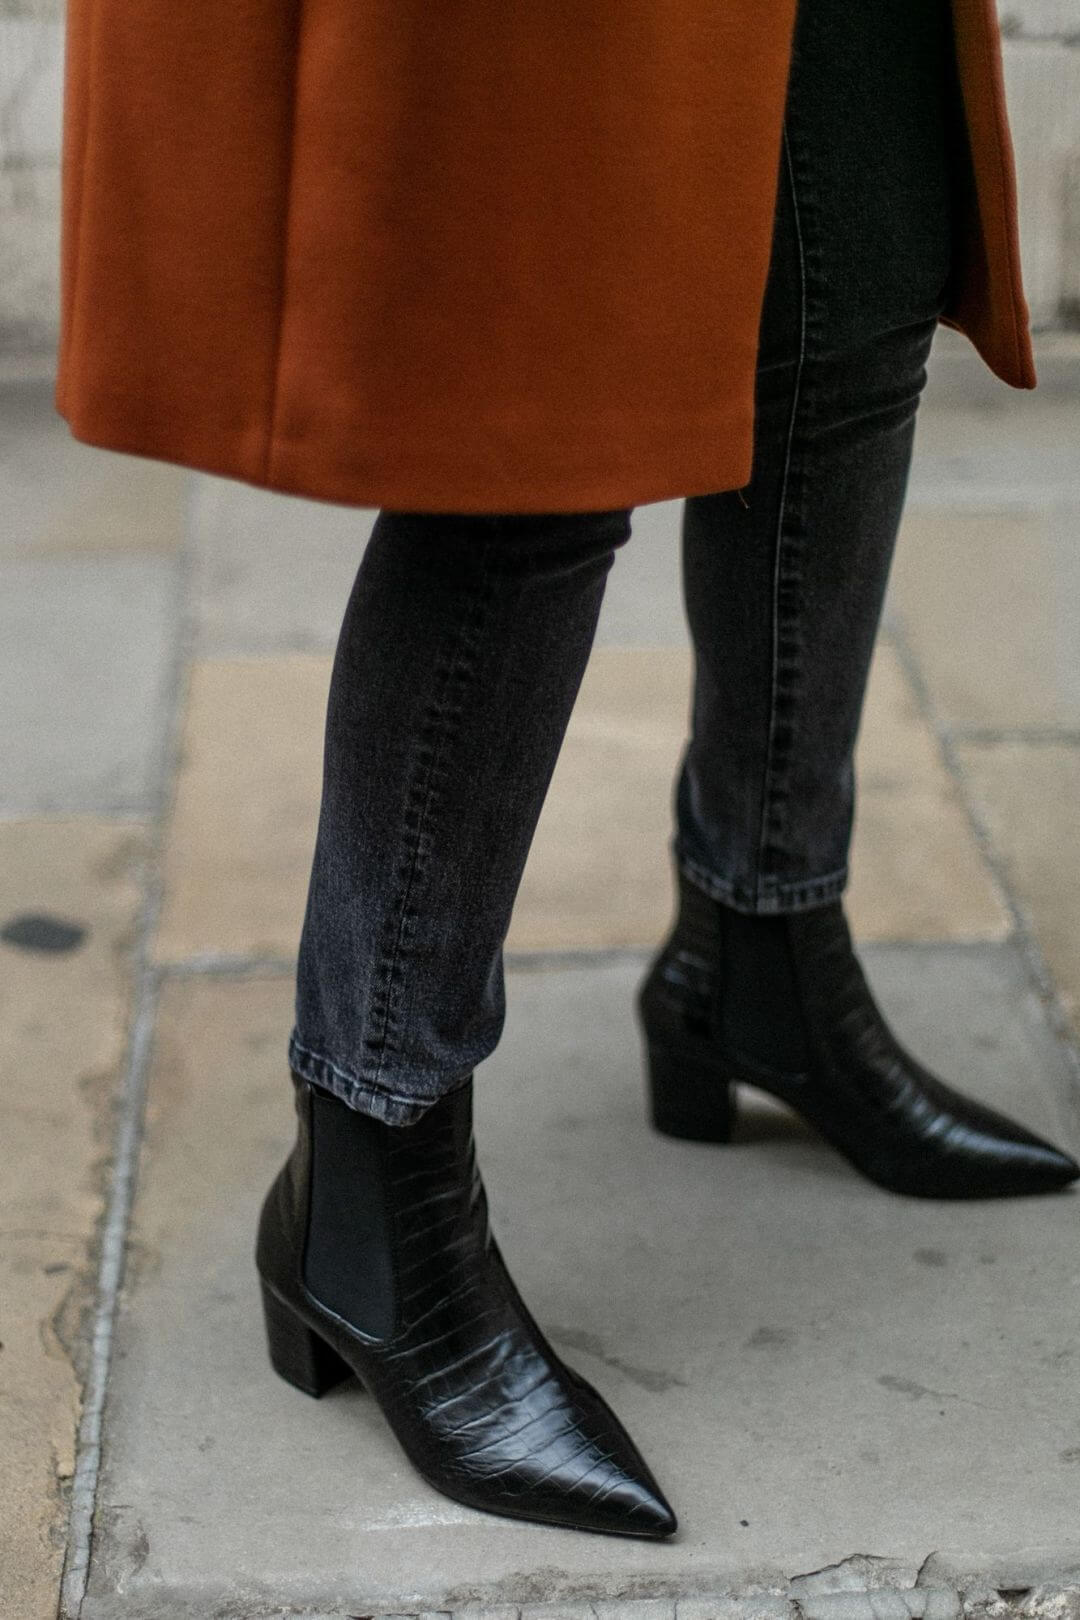 stampa effetto coccodrillo - ankle boots neri